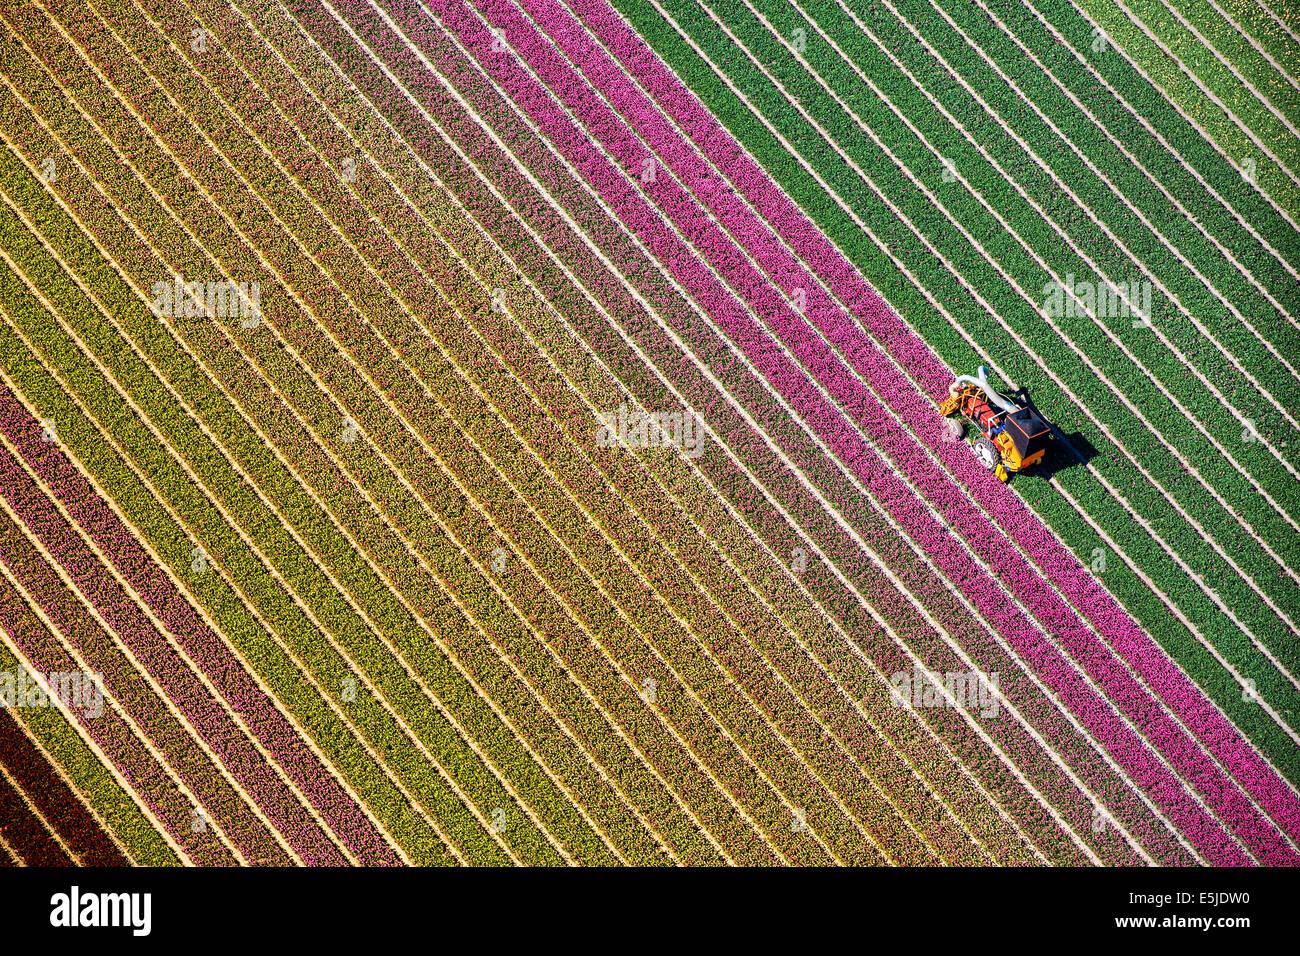 Paesi Bassi, Burgervlotbrug, campi di tulipani, agricoltore topping tulipani. Antenna Immagini Stock